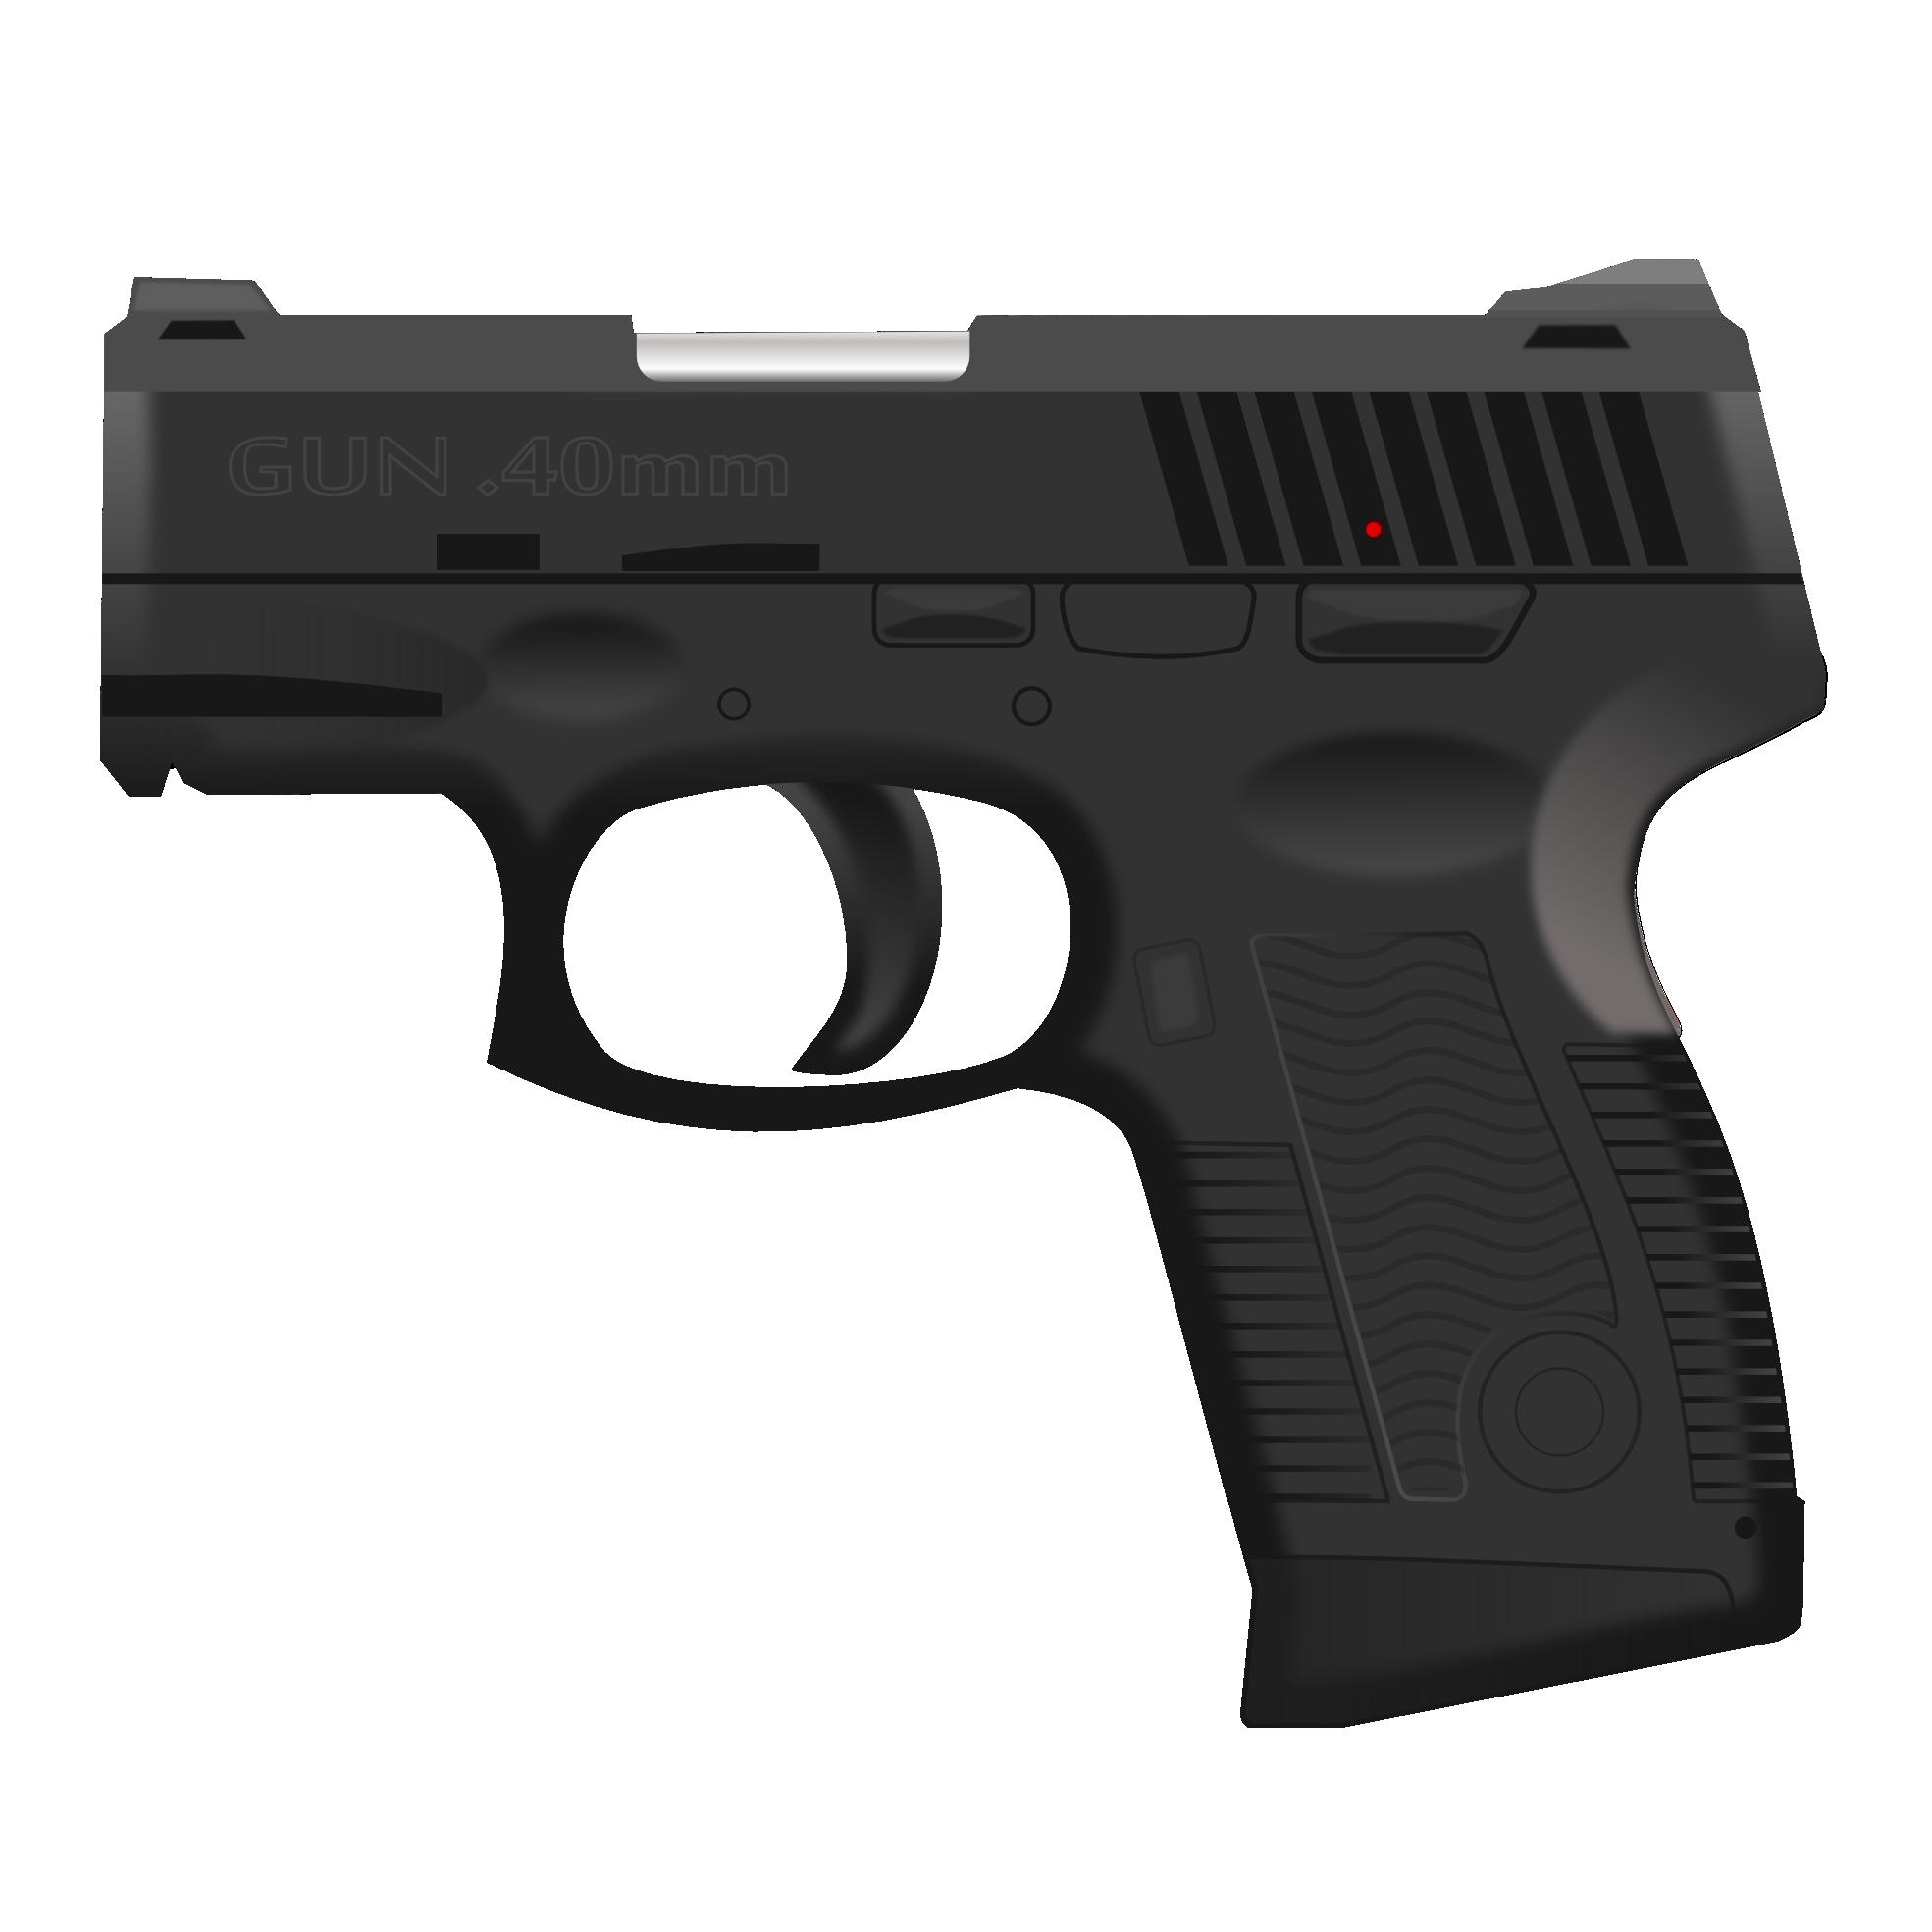 Shotgun clipart transparent background Image PNG images gun image